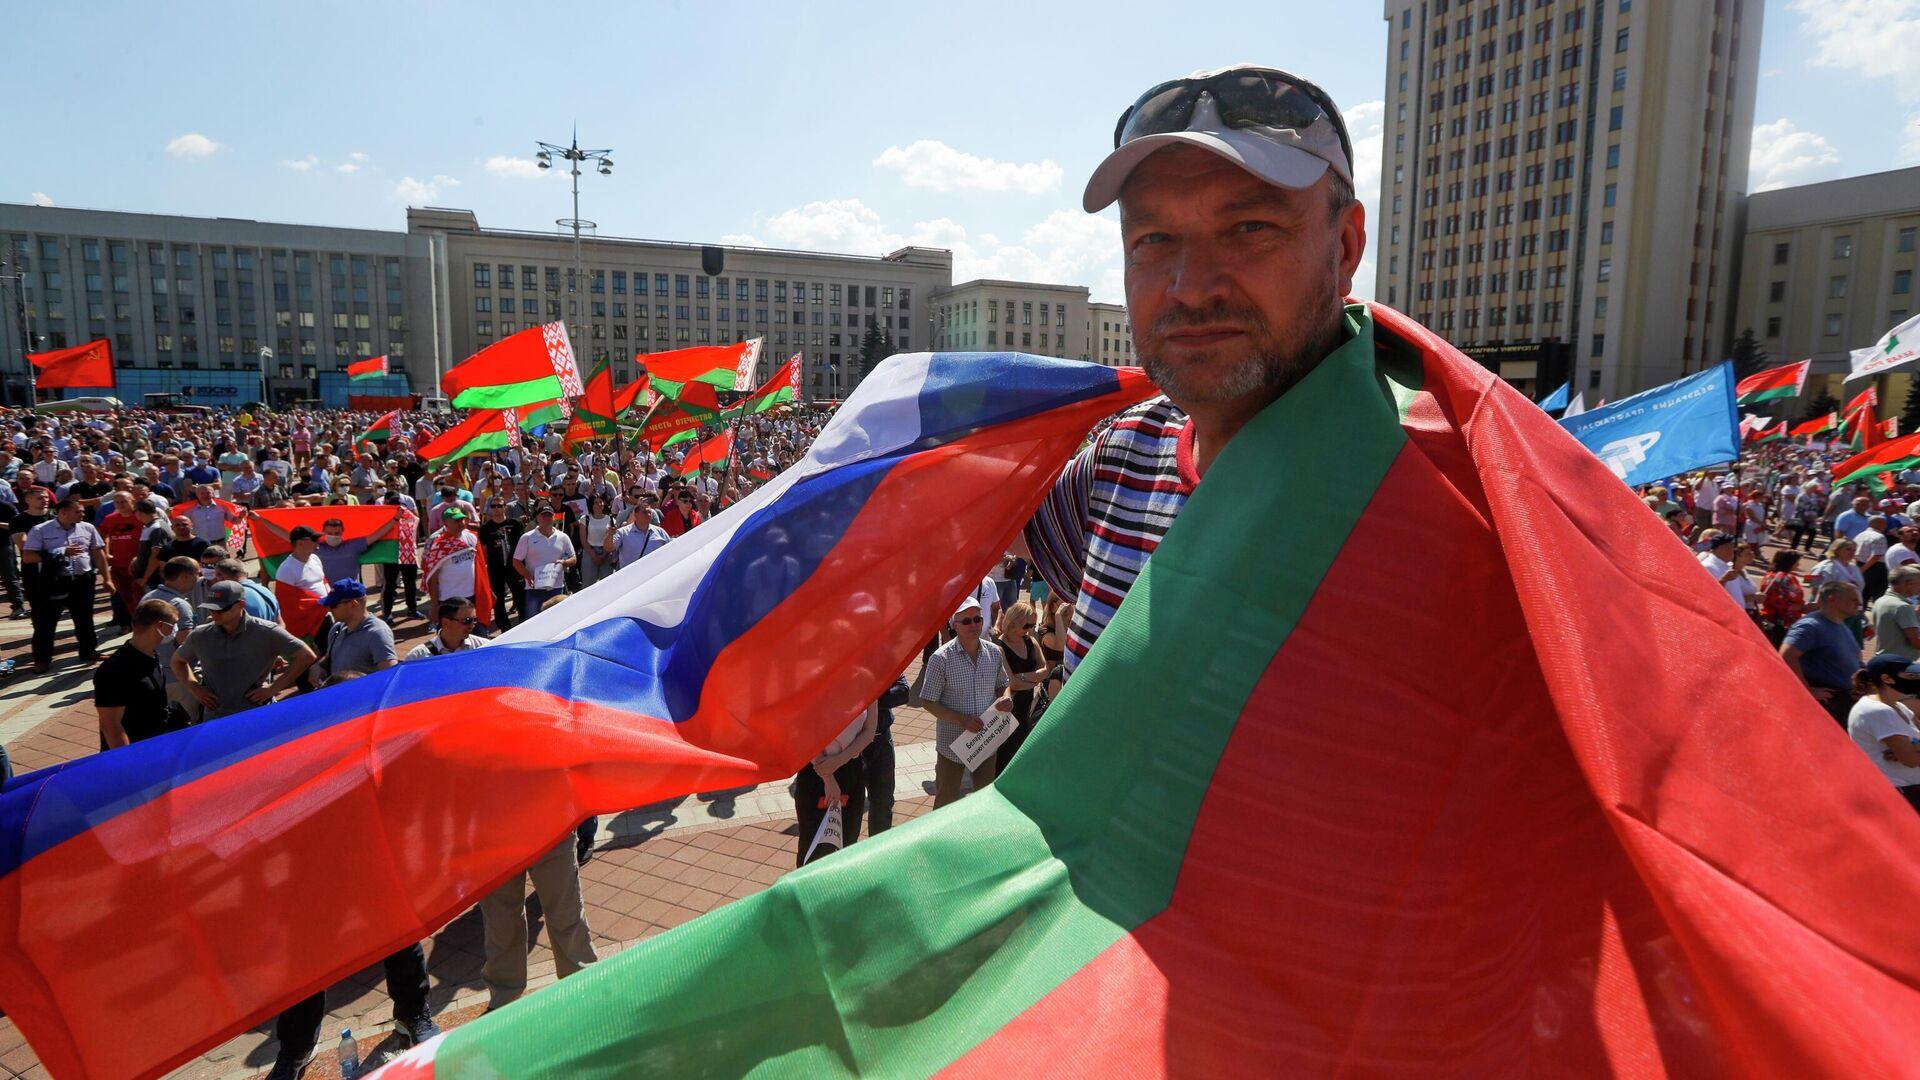 Мужчина на митинге, организованном в его поддержку Александра Лукашенко на площади Независимости в Минске - РИА Новости, 1920, 10.09.2020